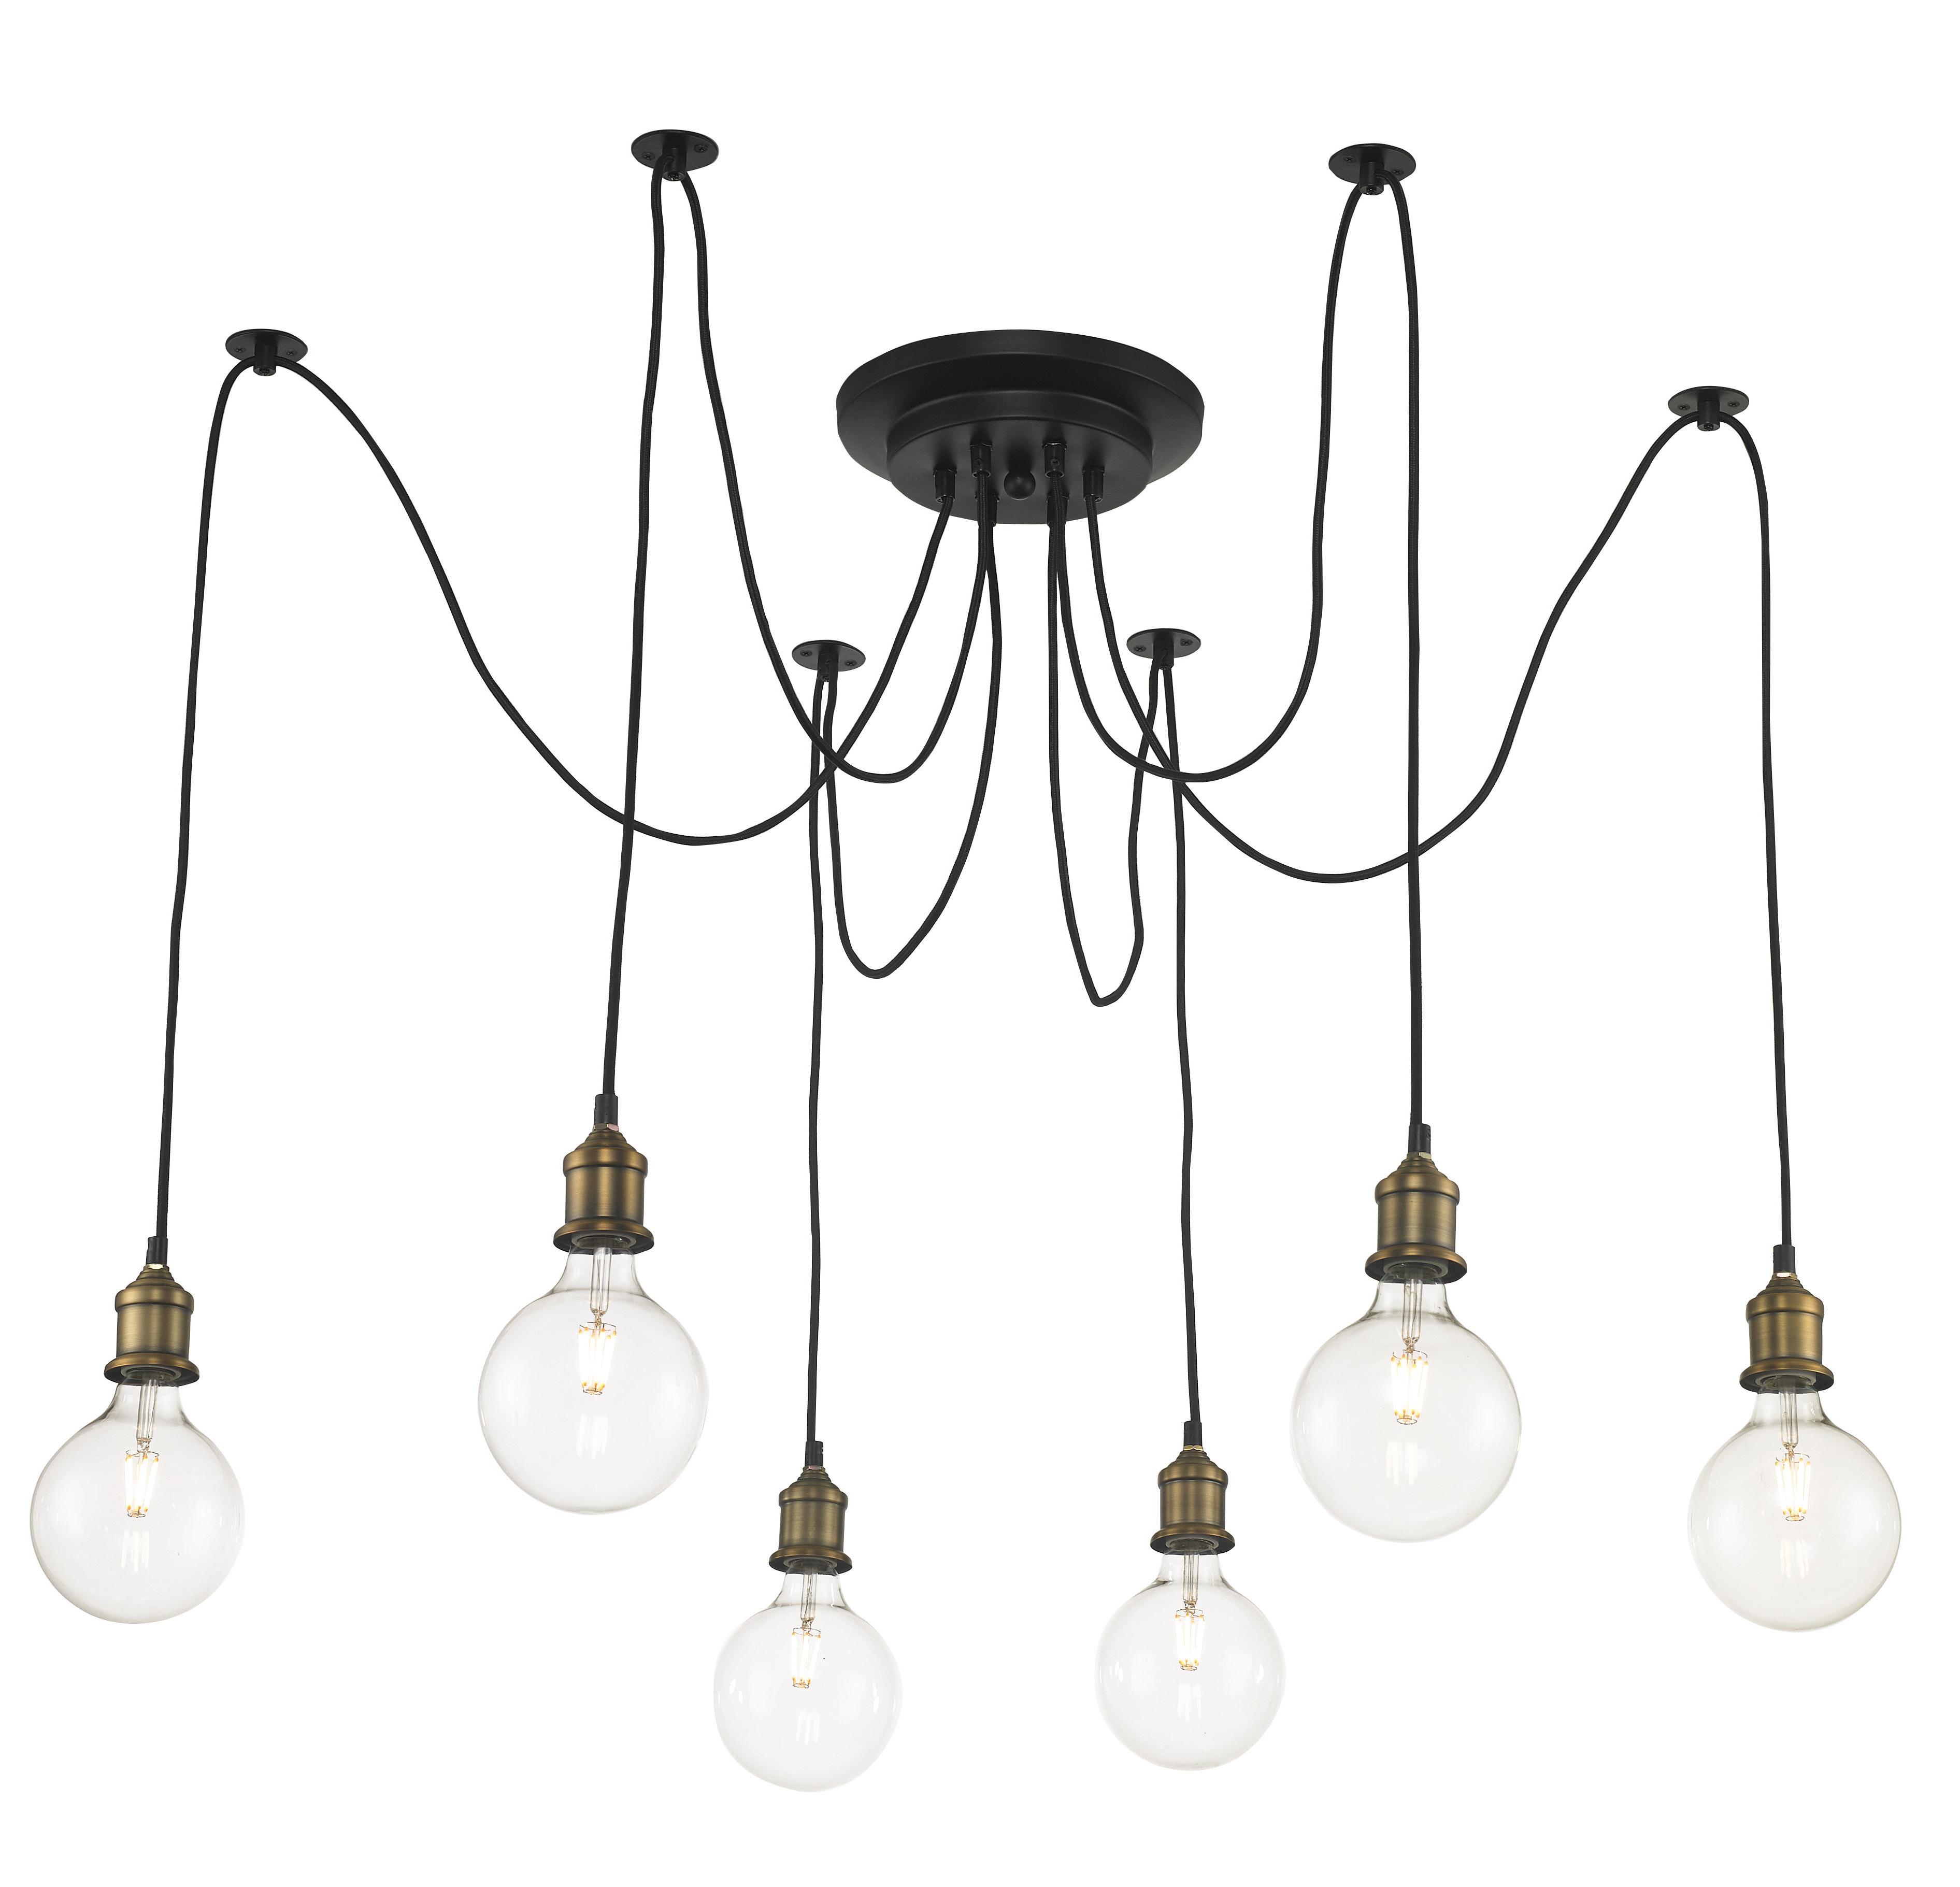 Colton 6 Light Cluster Bulb Pendant Intended For Trendy Gattilier 3 Light Cluster Pendants (View 5 of 20)